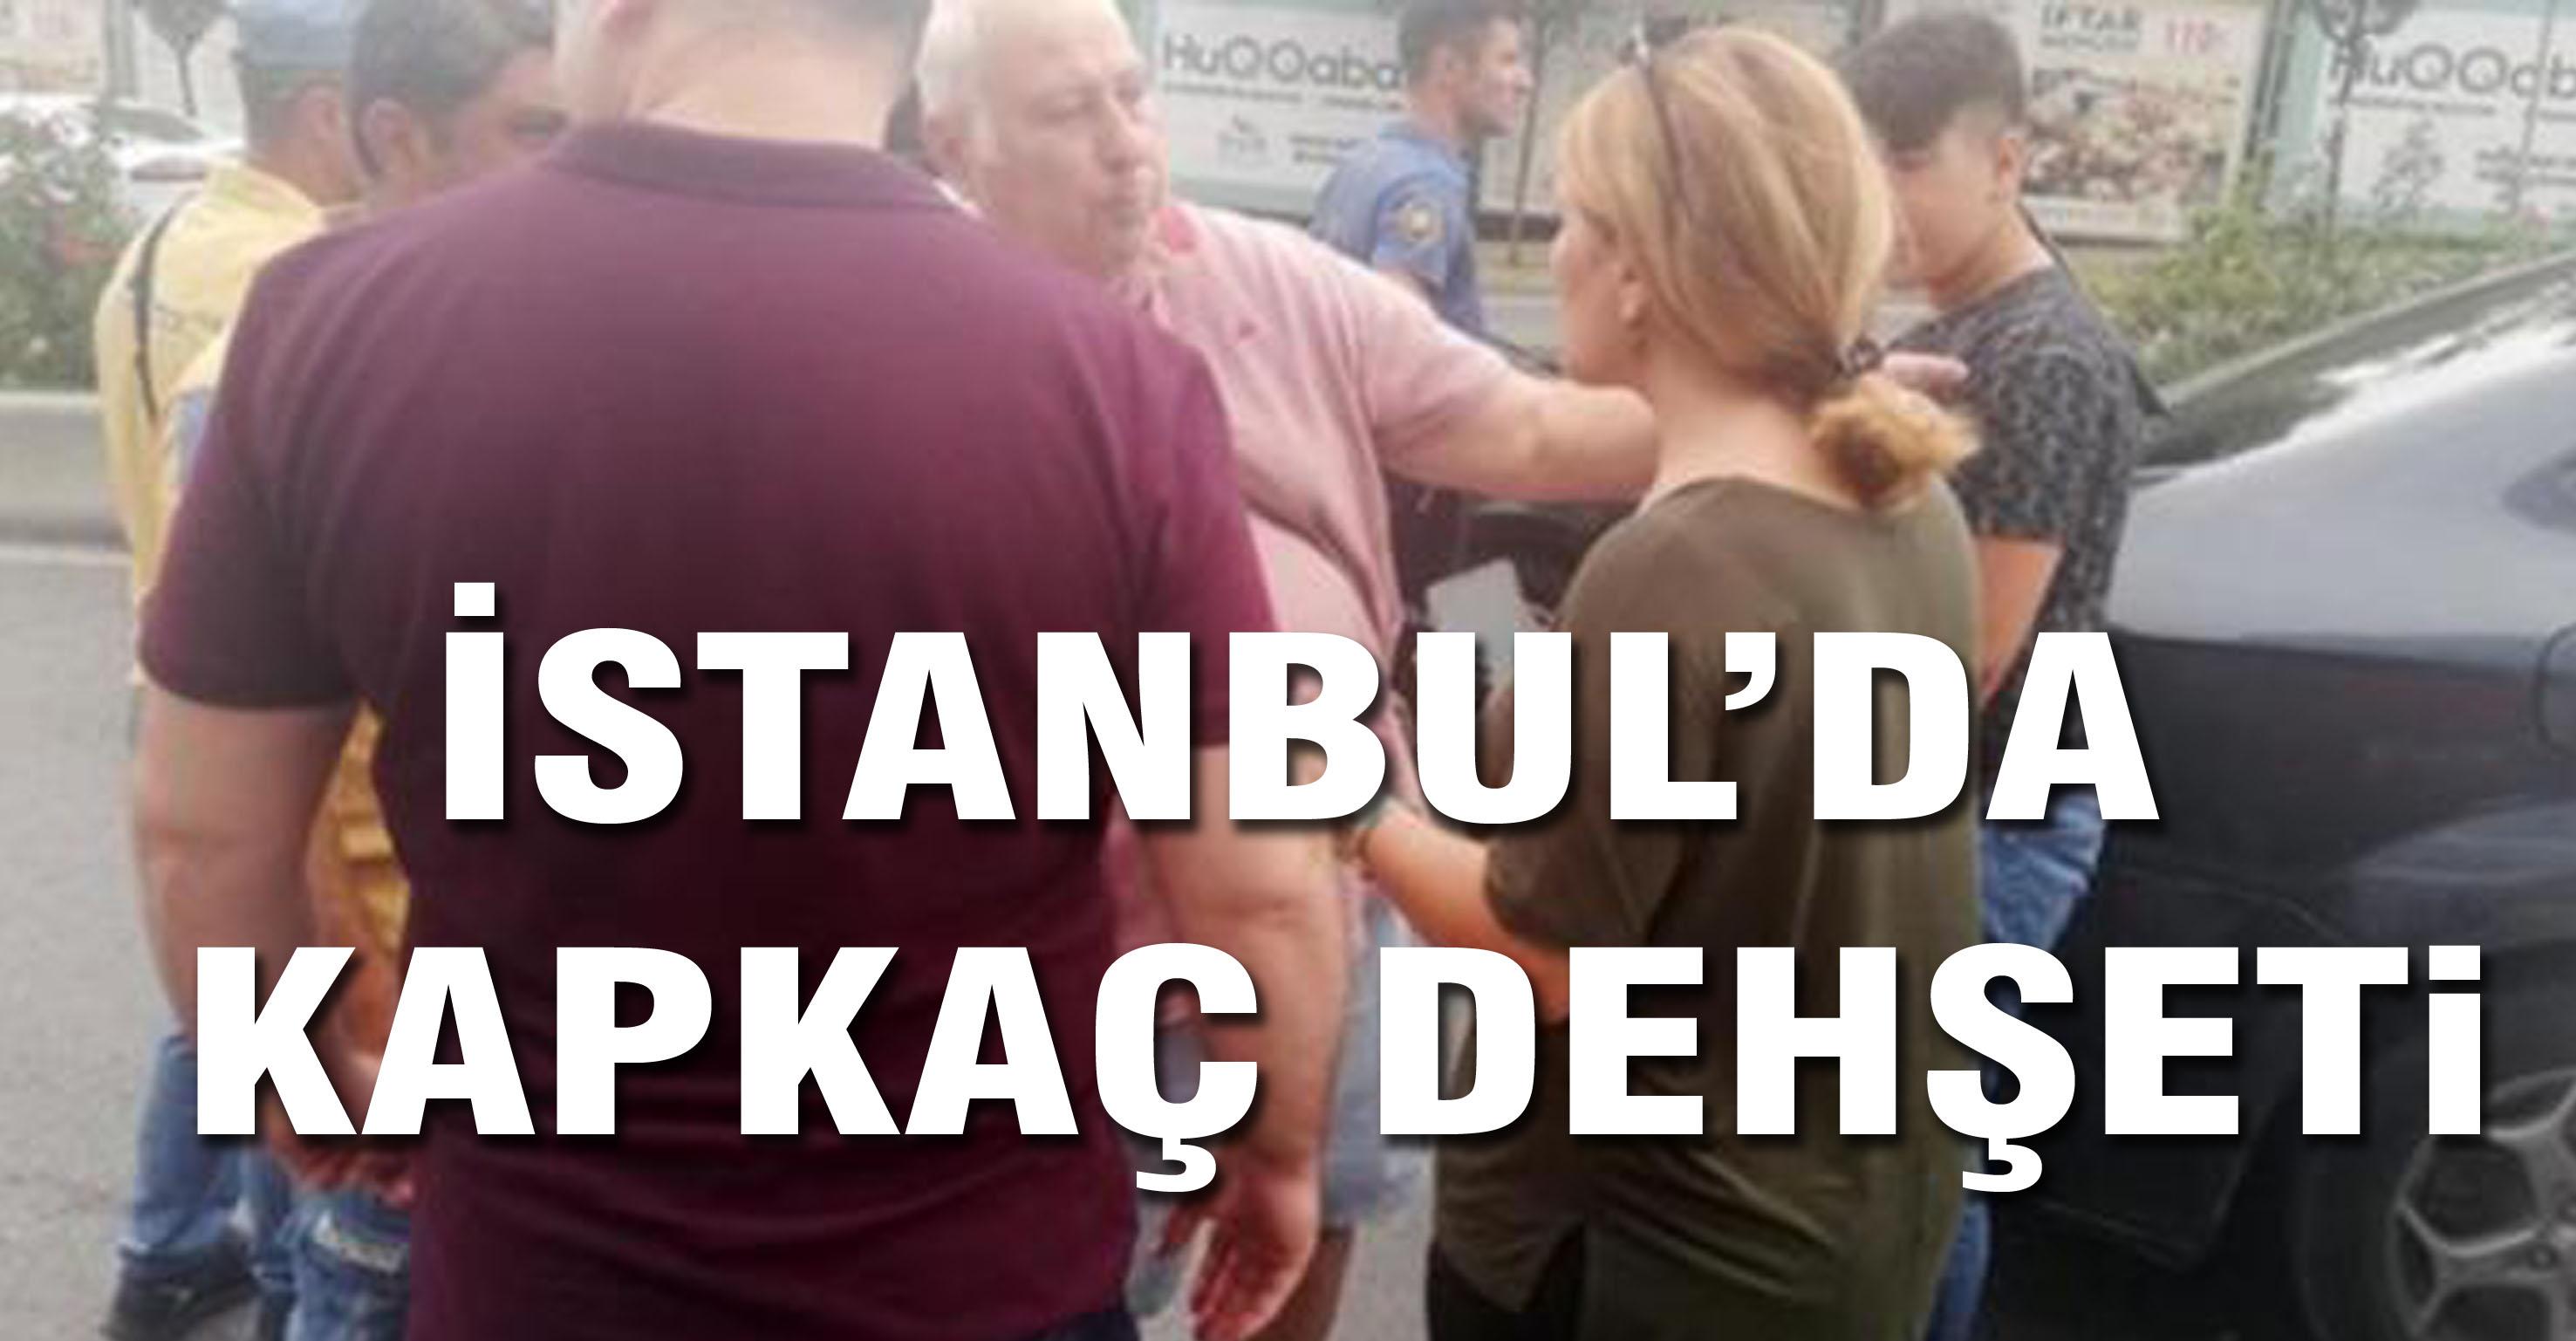 İstanbul'da kapkaç dehşeti!